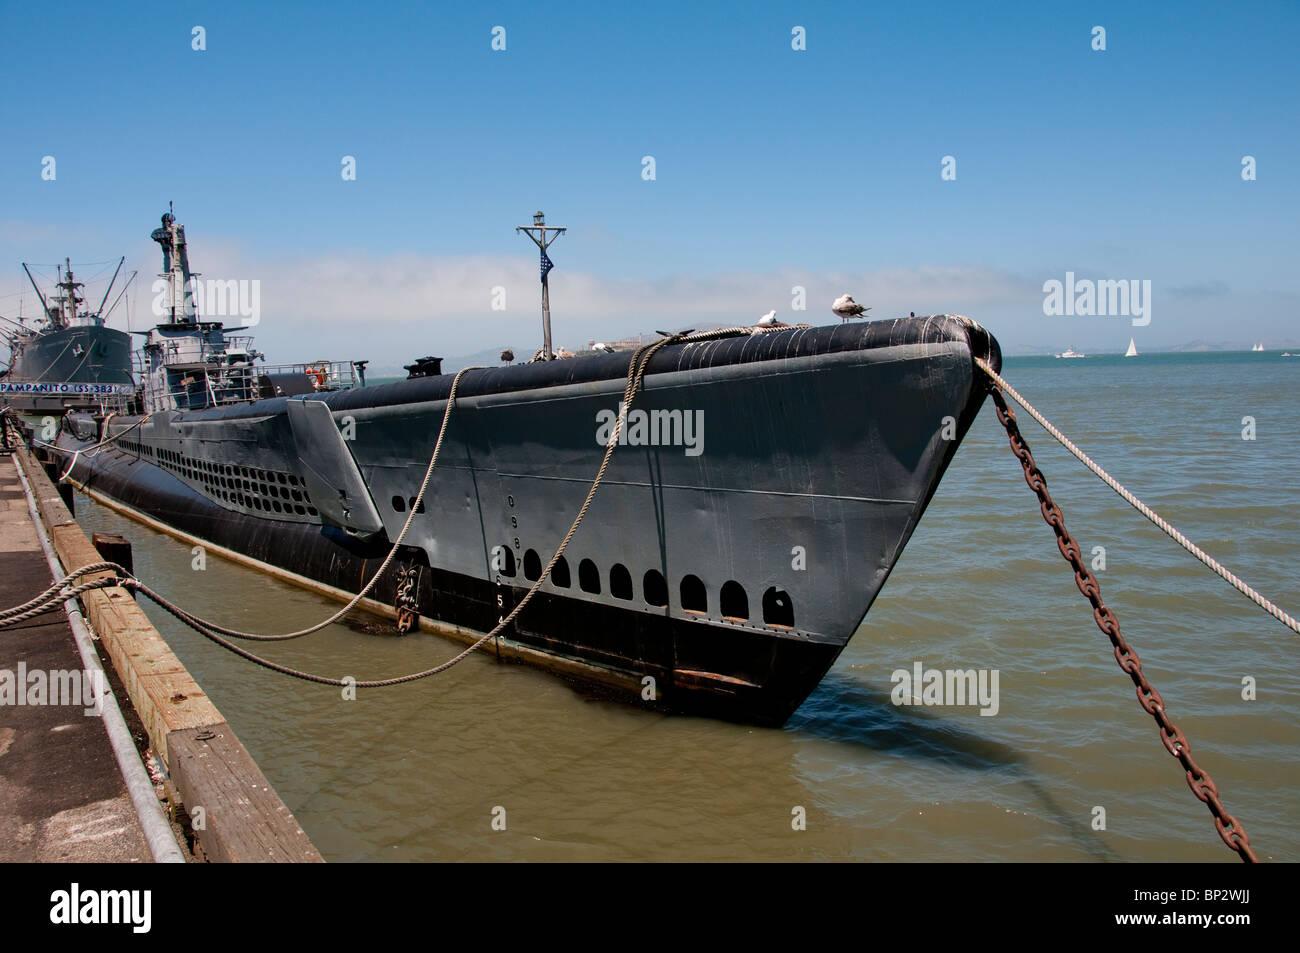 San Francisco: WWII submarine Pampanito at Fisherman's Wharf. Photo copyright Lee Foster. Photo # casanf104169 - Stock Image